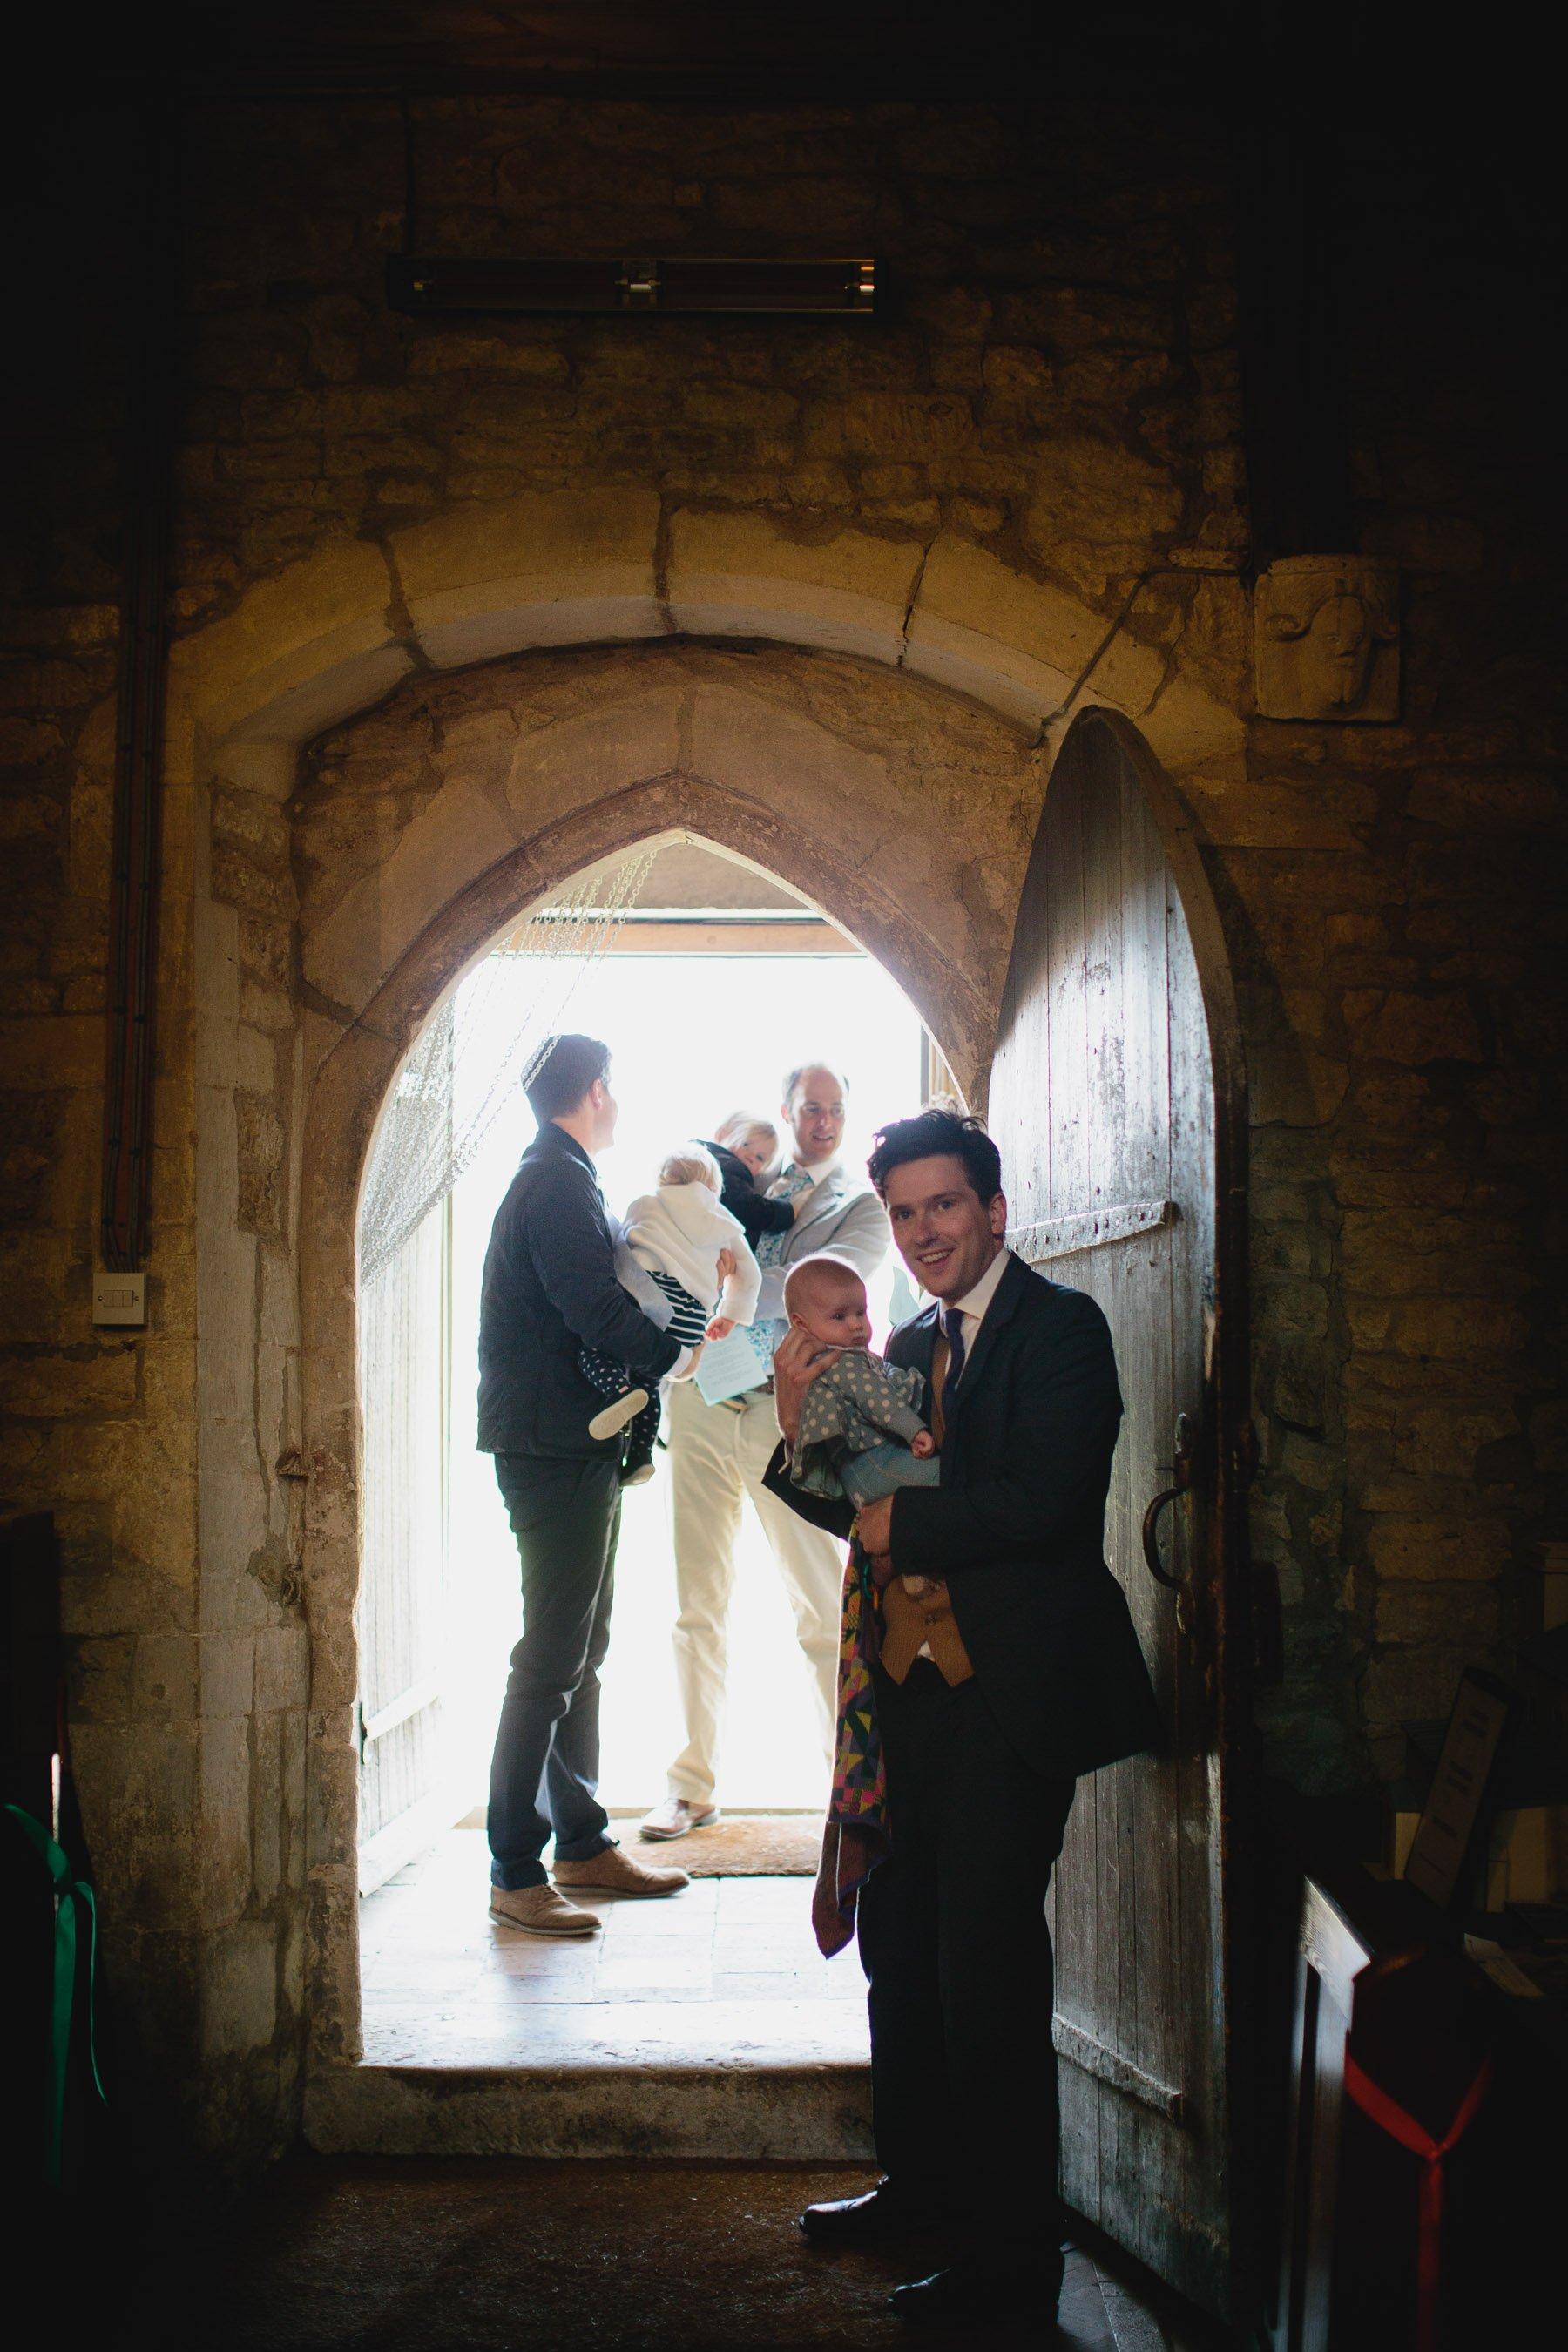 Buckinghamshire-Wedding-Lizzie-Duncan-071